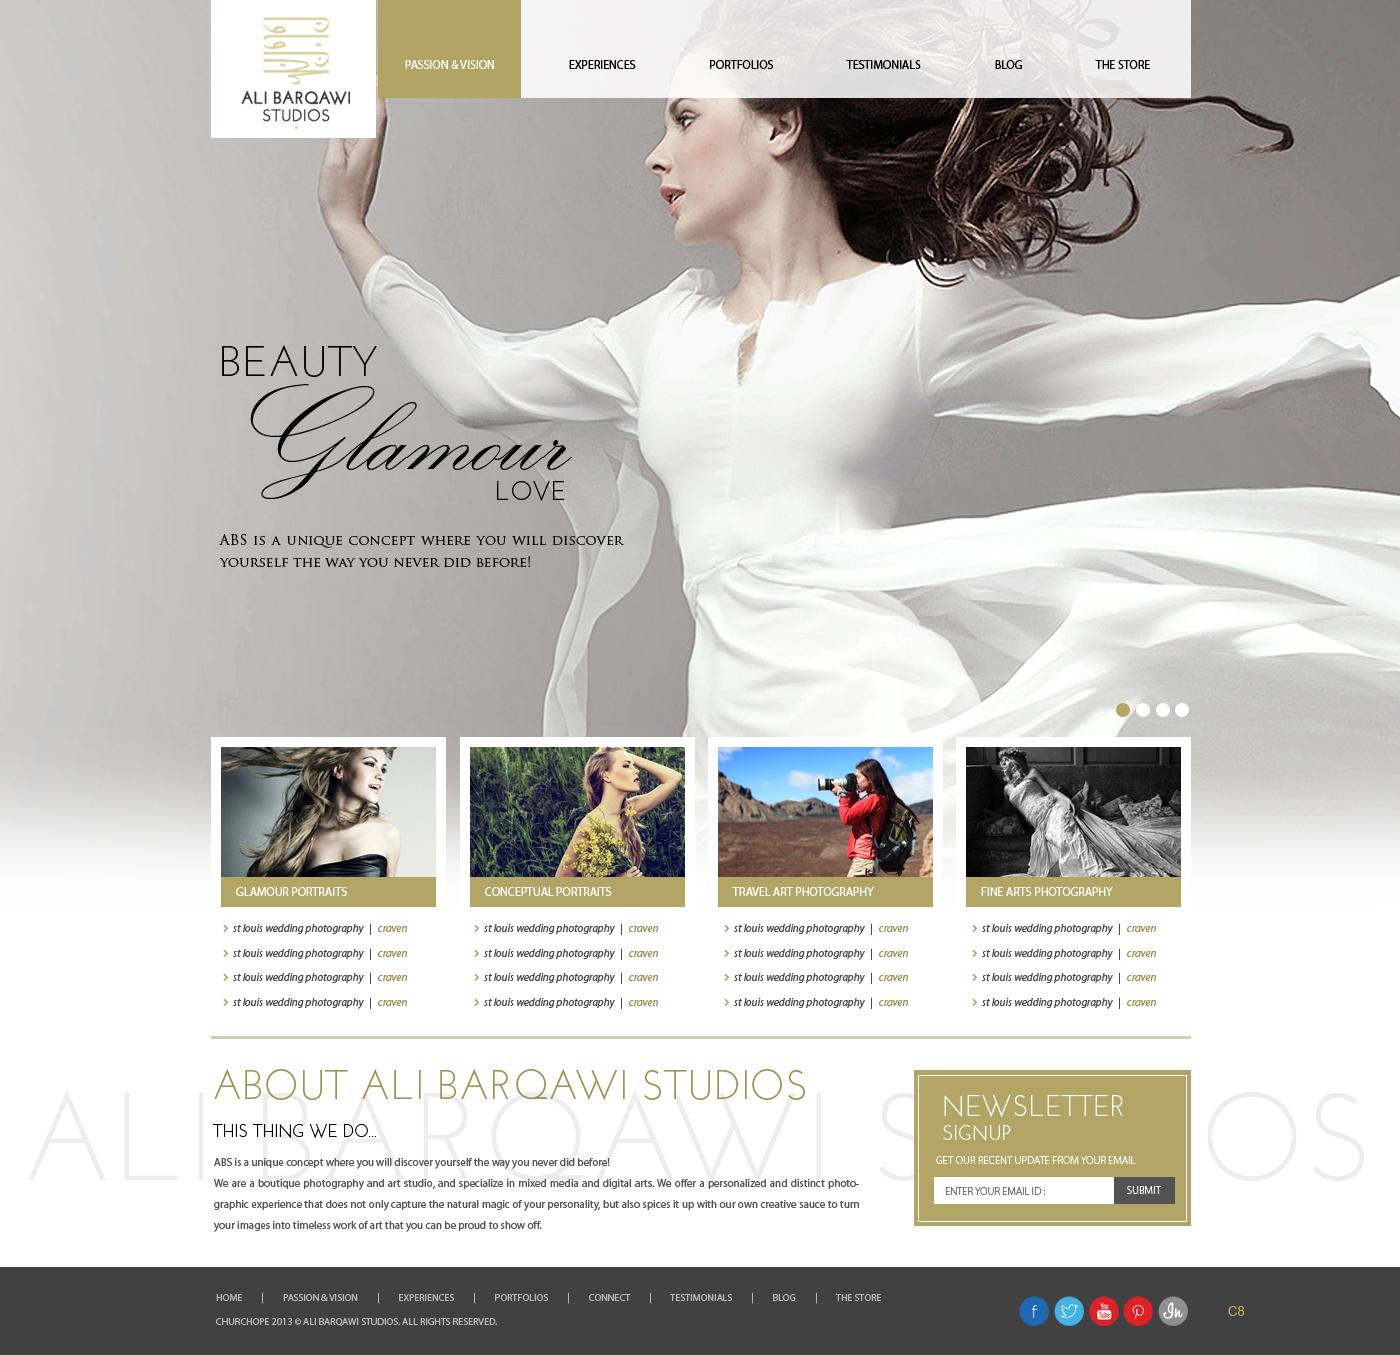 Upmarket Modern Portrait Photography Wordpress Design For Ali Barqawi Studios By Pb Design 1845933